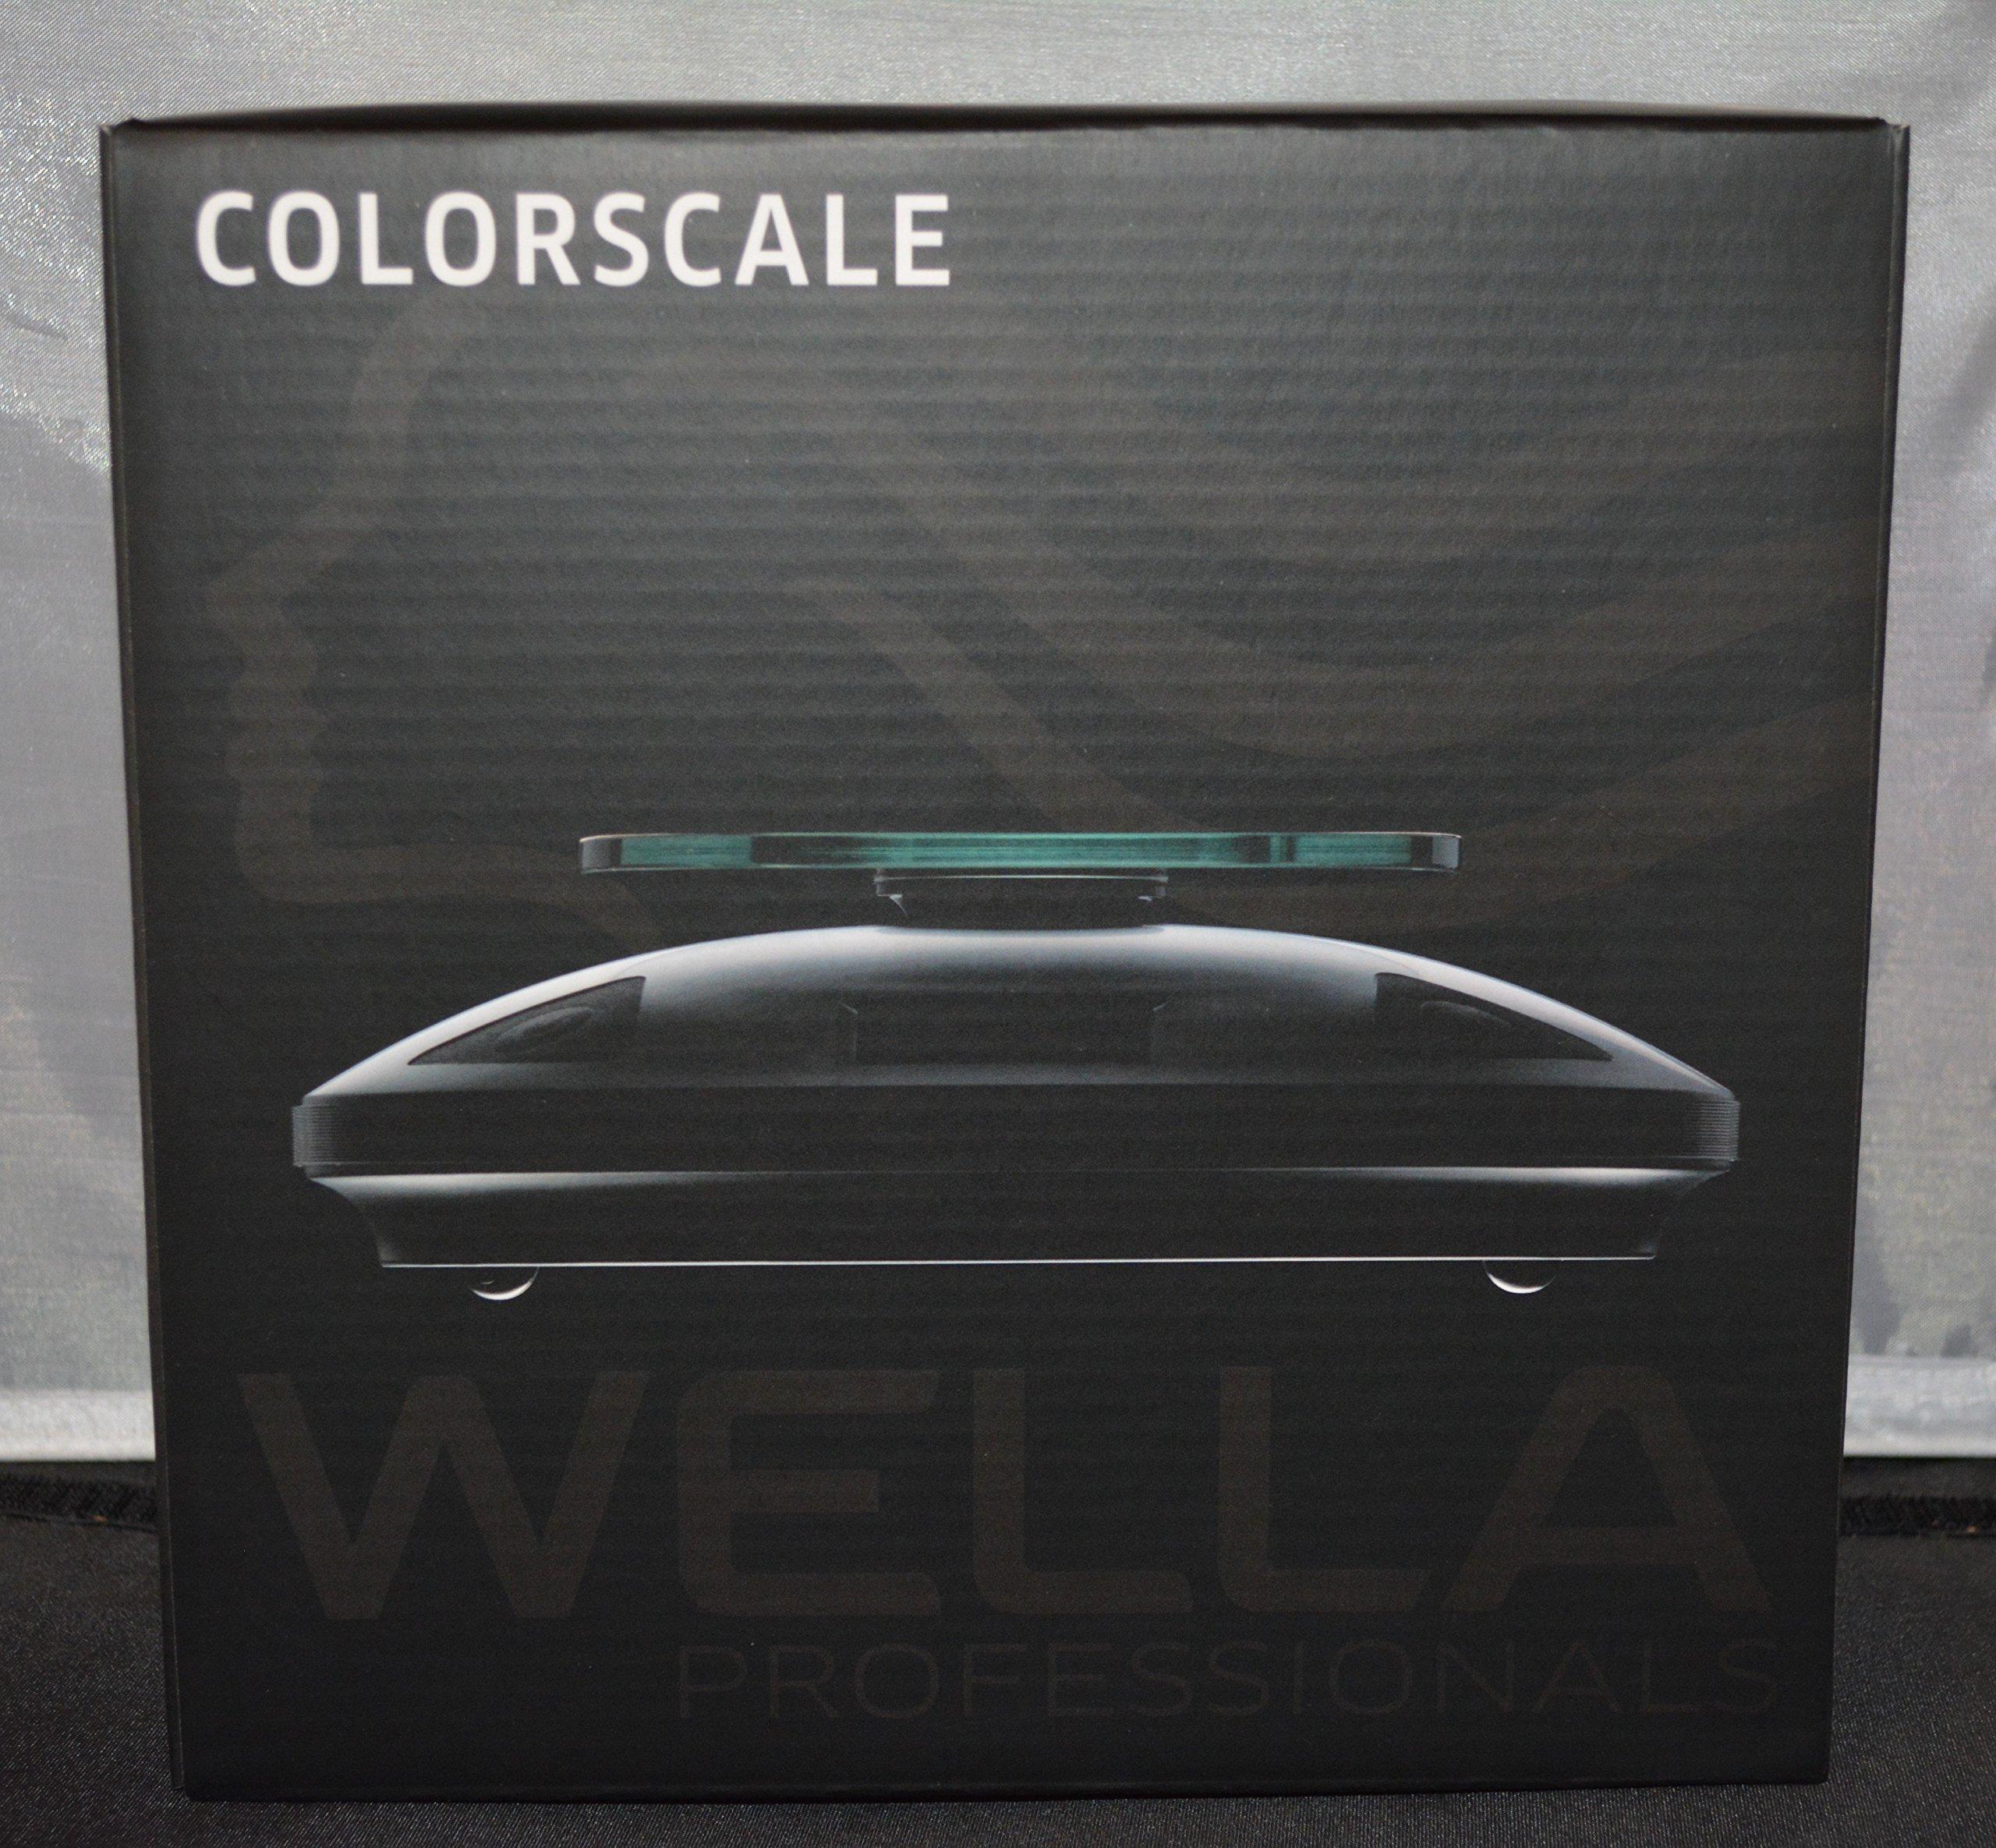 Wella Color Scale 1182 ColorScale for Professionals